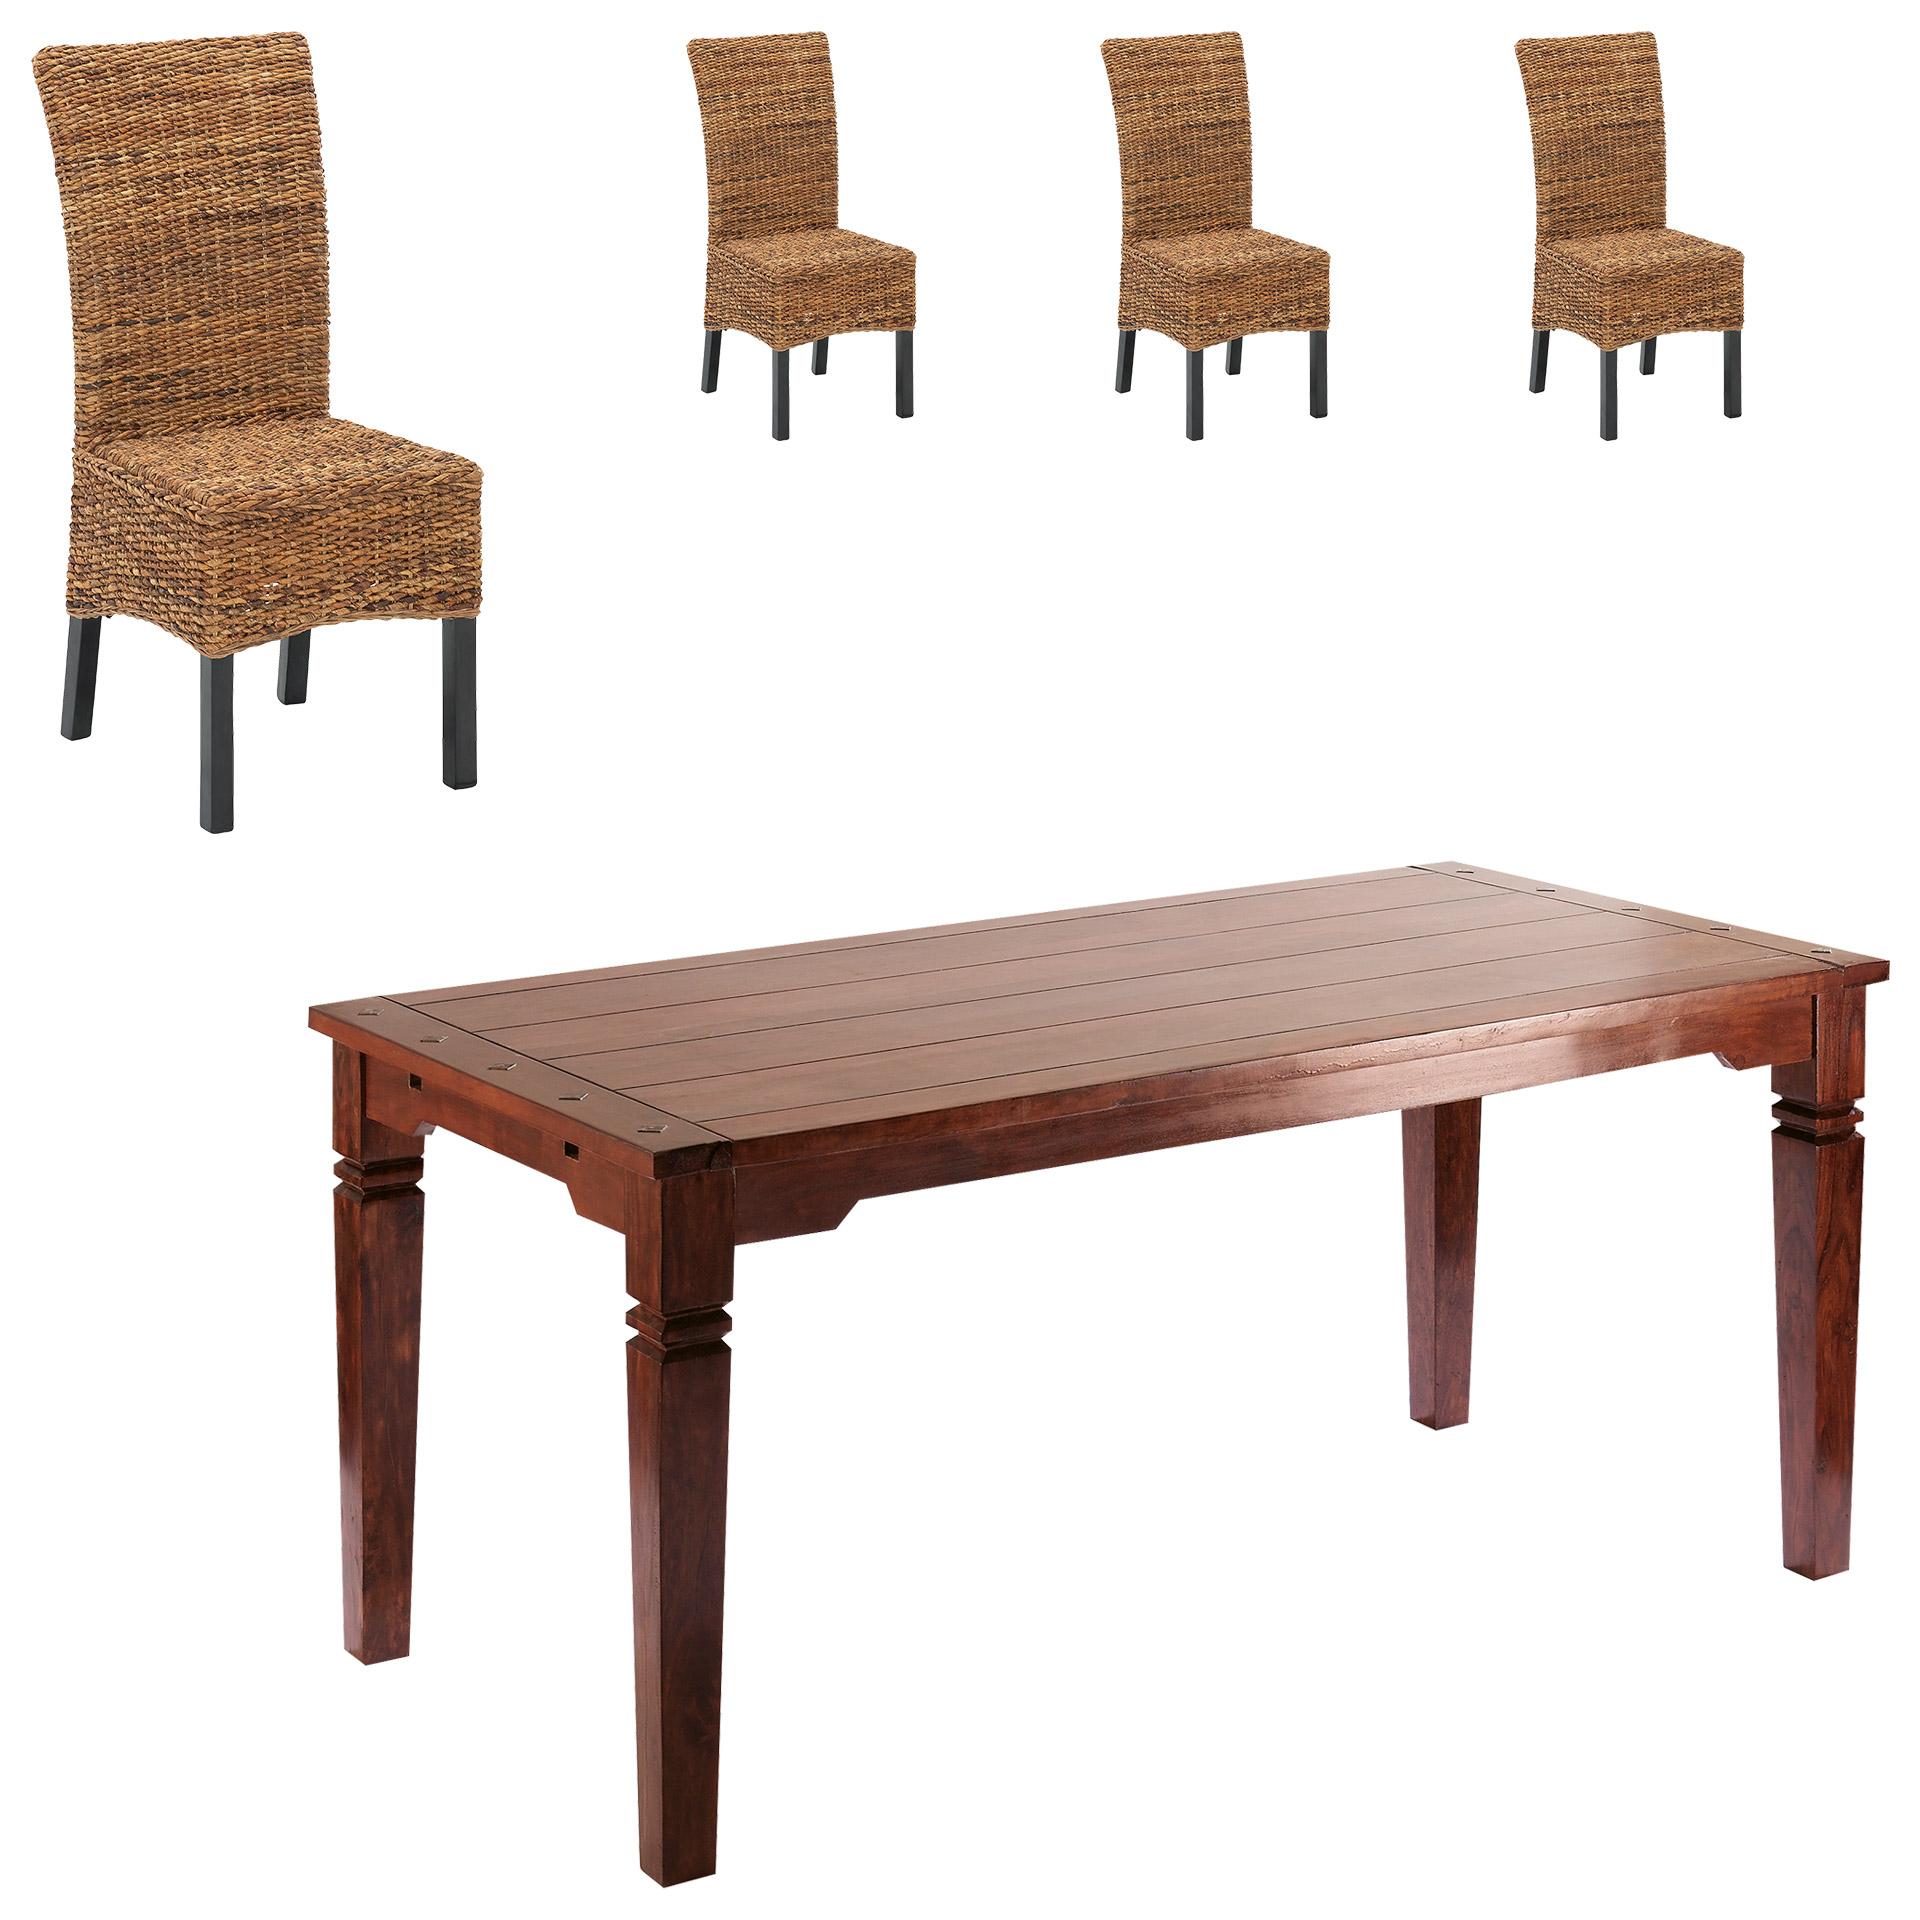 essgruppe cuba rio 90 140 4 st hle. Black Bedroom Furniture Sets. Home Design Ideas